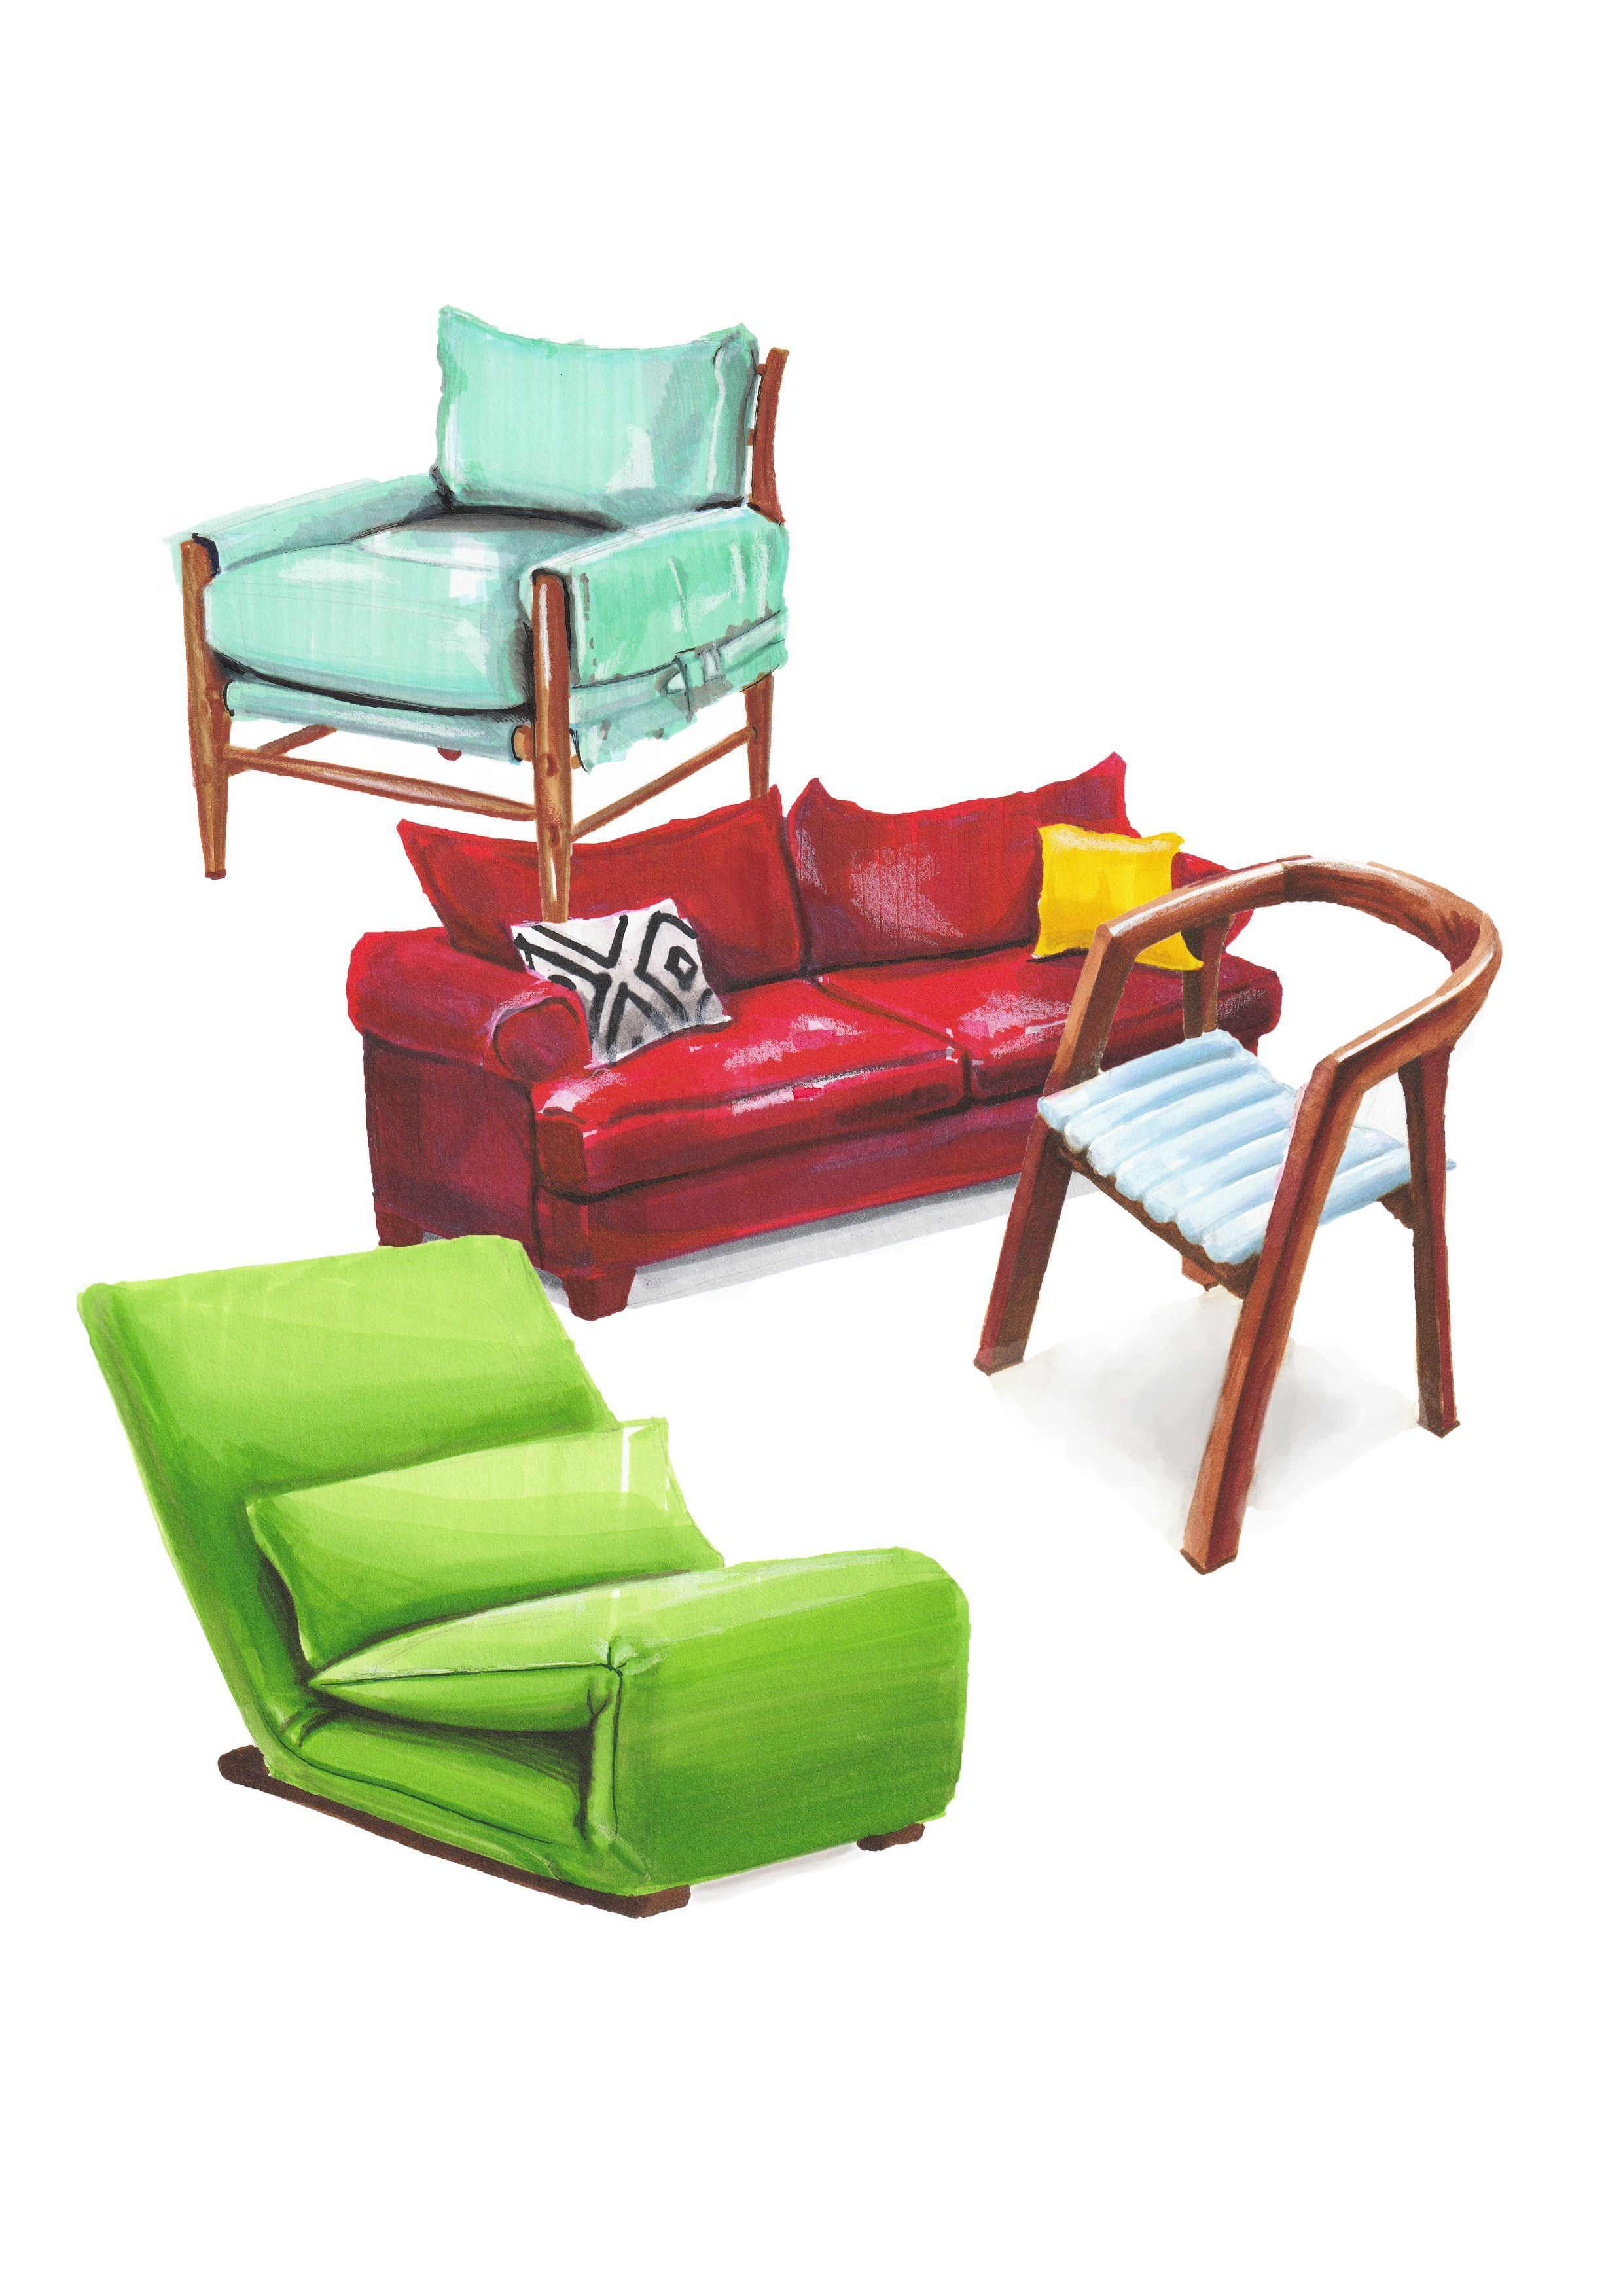 2480x3508 Furniture Sketch Marker Sofa Chair